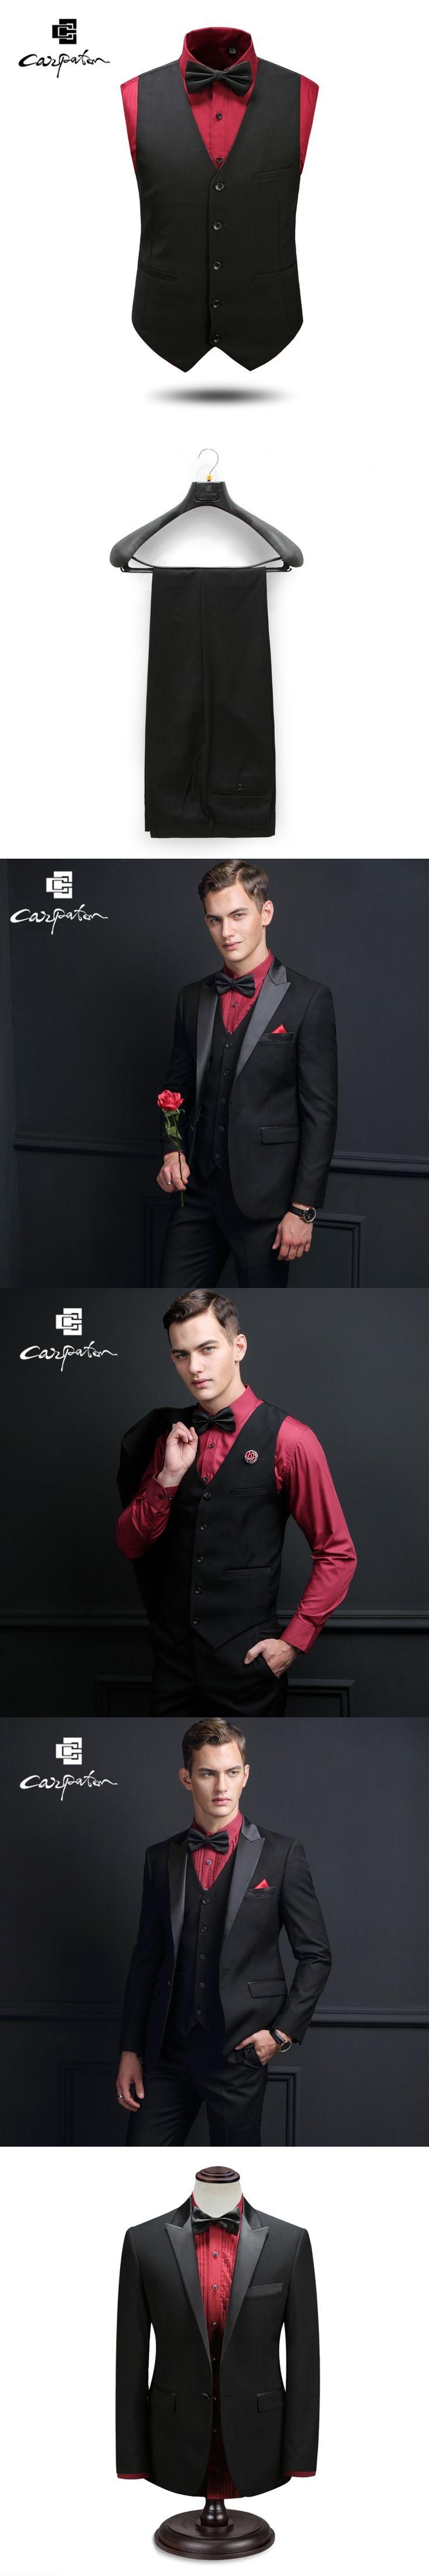 Carpaton Men Suit Black Wool Designer Three Piece Suit Brand The Peaked Lapel Tuxedo Large Size Grooms Wedding Suits For Men